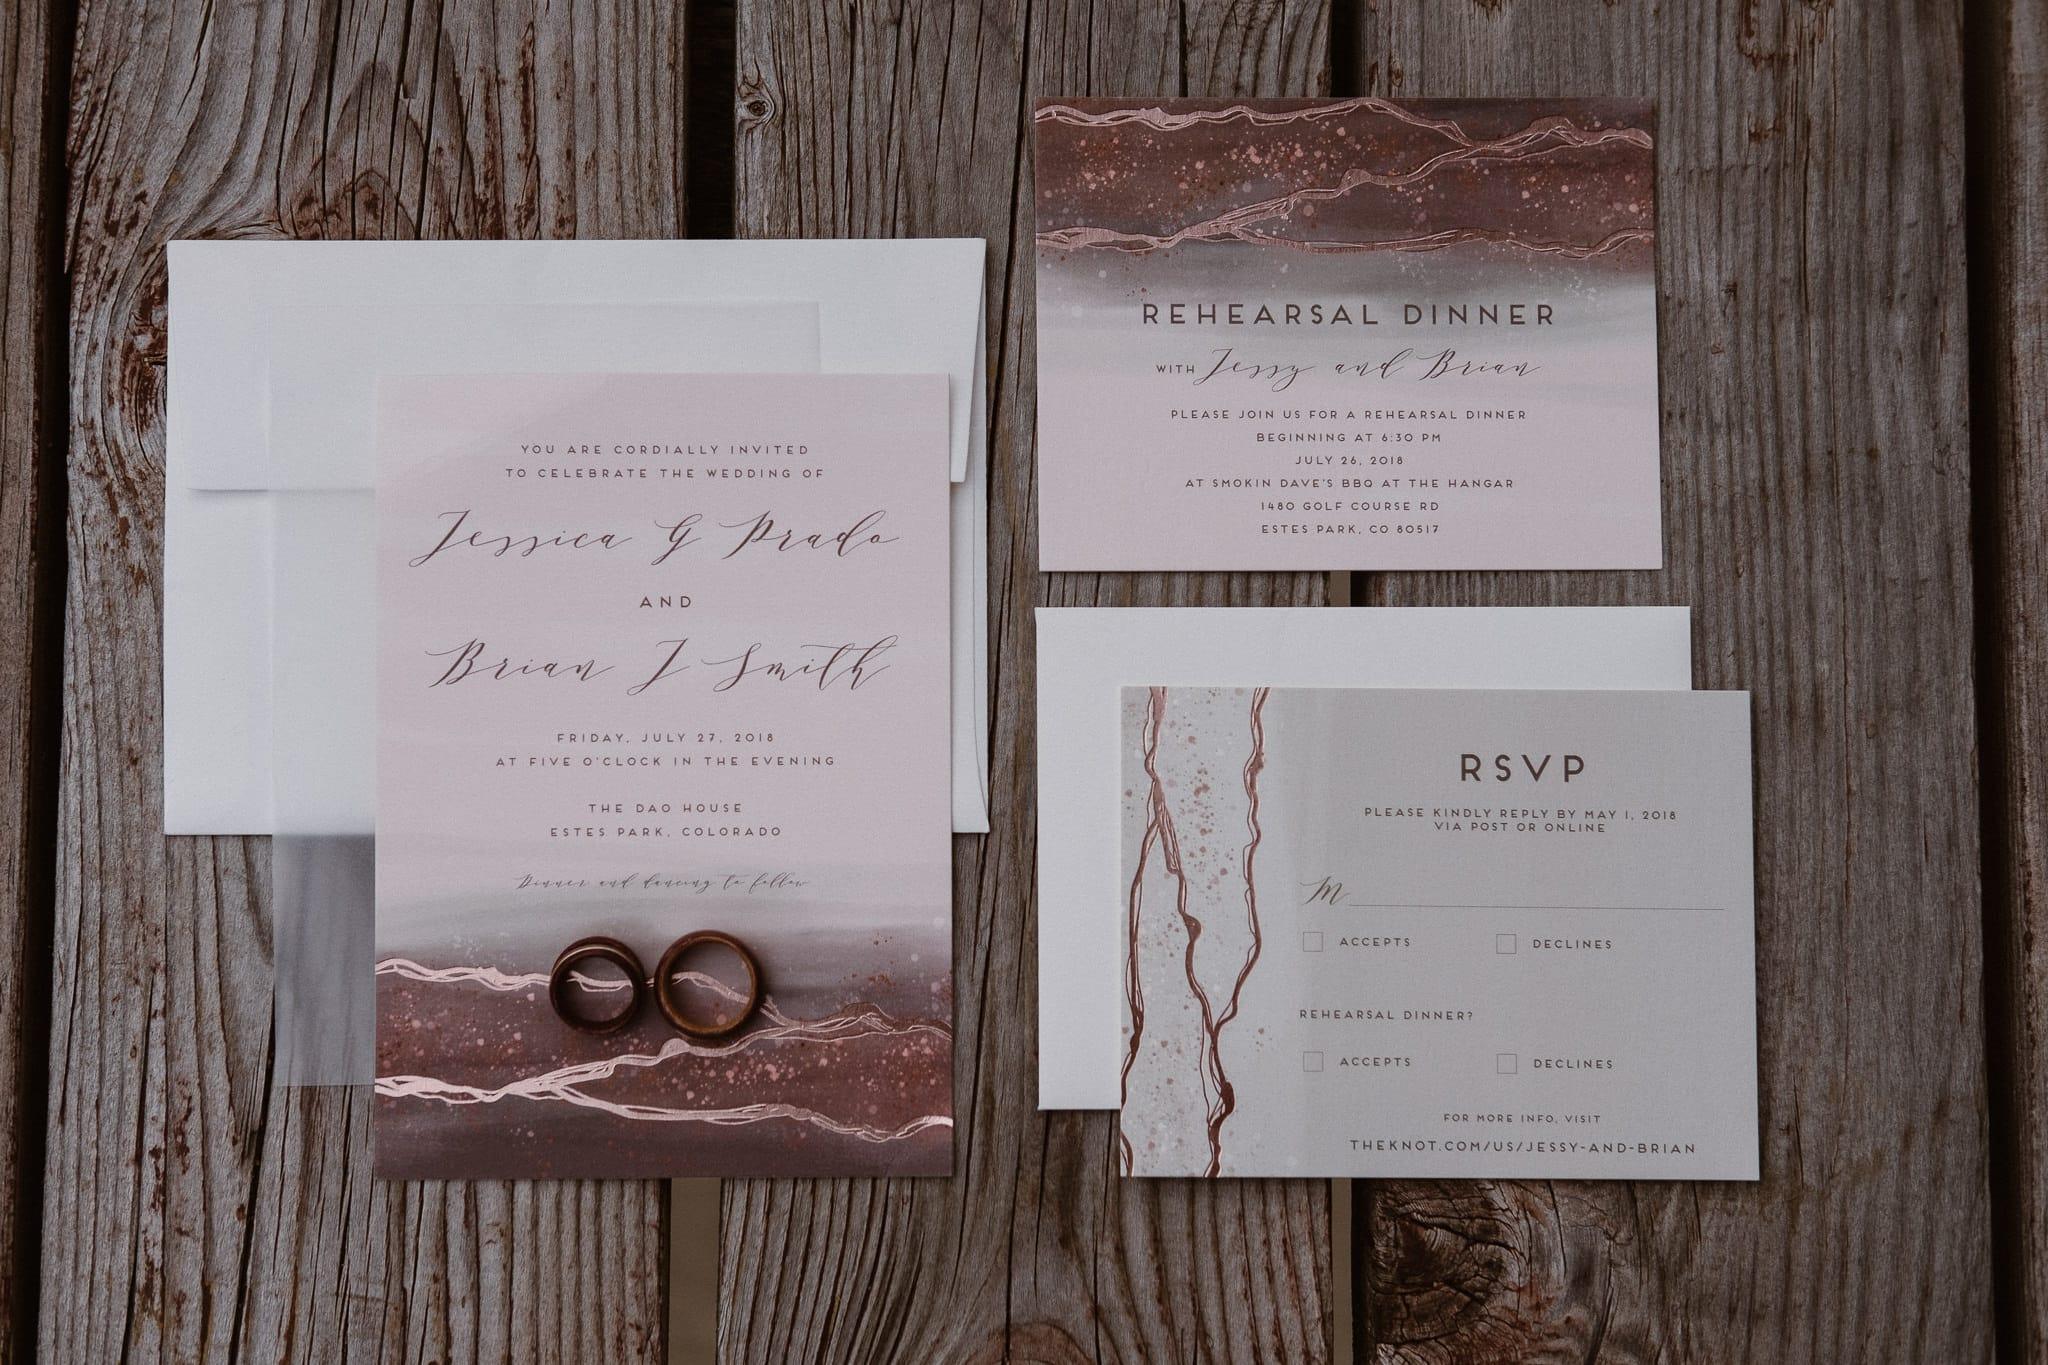 Dao House wedding photographer, Estes Park wedding venue, Colorado mountain wedding, Minted wedding invitations, pastel invitations